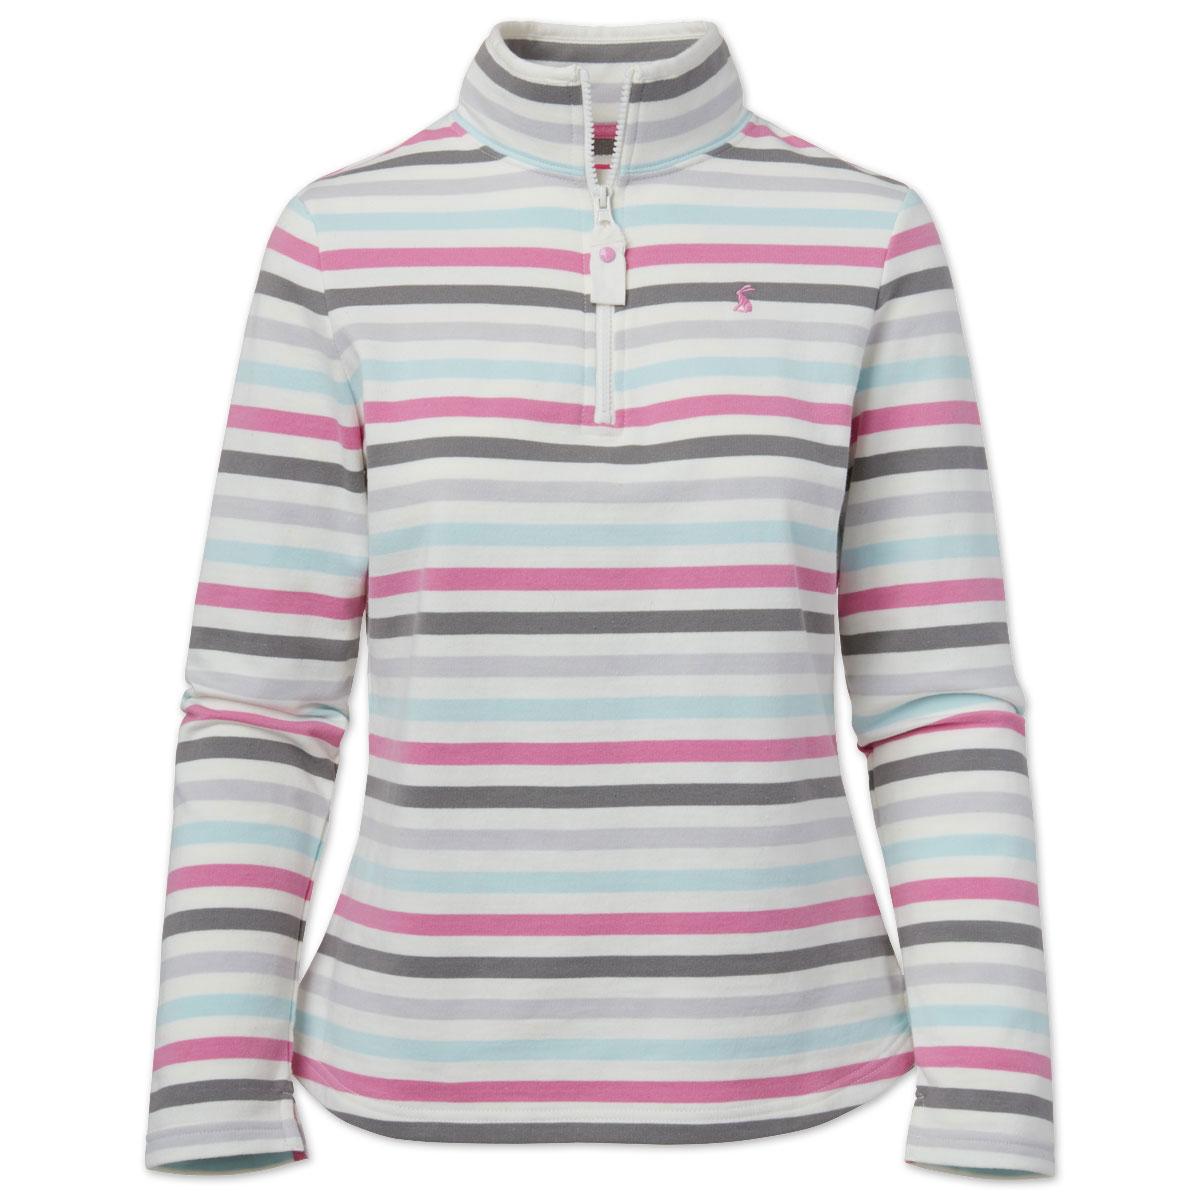 Joules Fairdale Half Zip Sweatshirt - Sale!